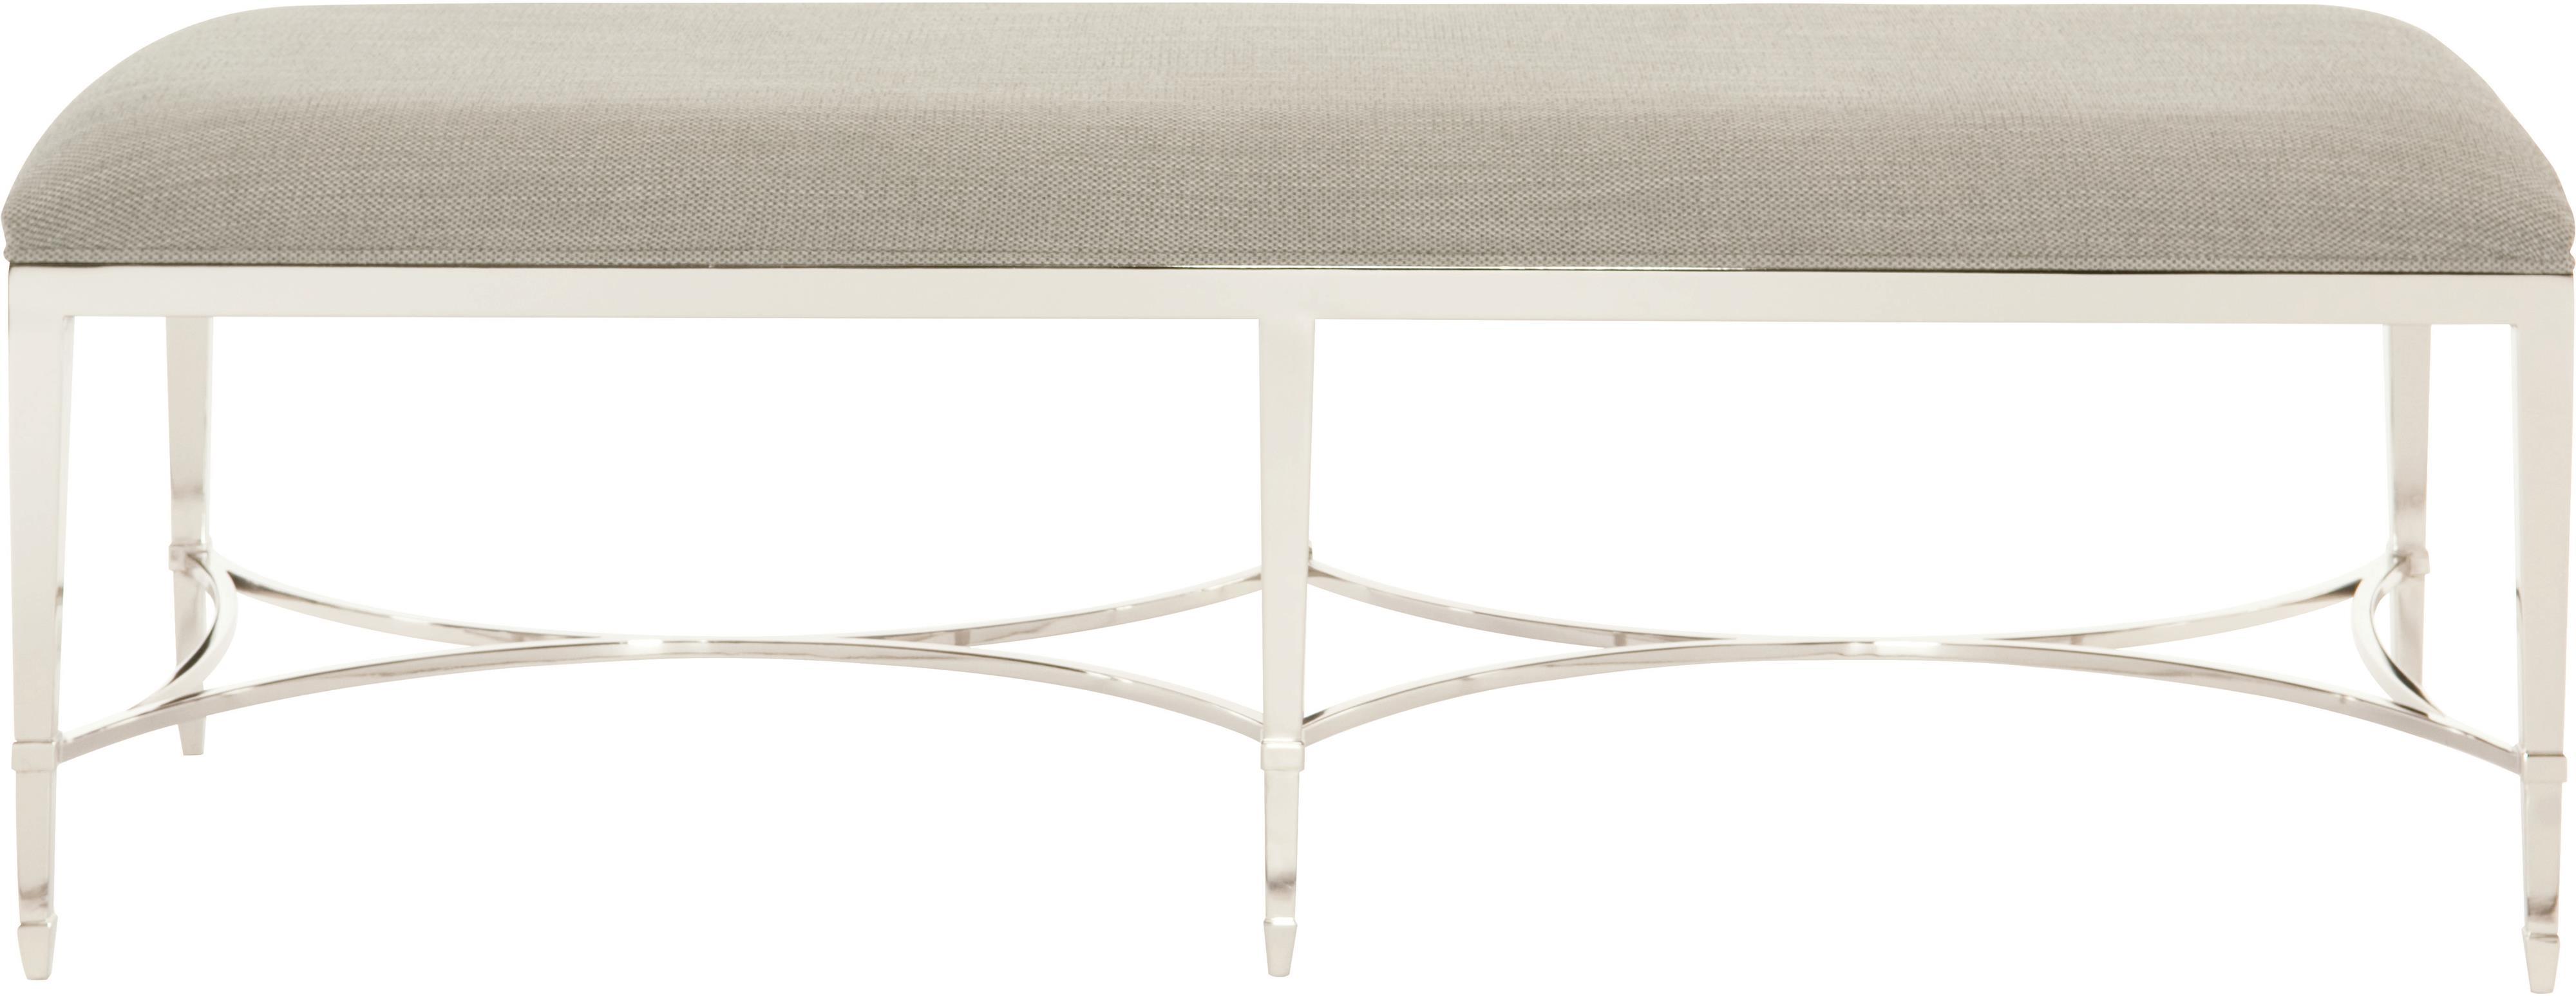 Criteria Bench by Bernhardt at Baer's Furniture